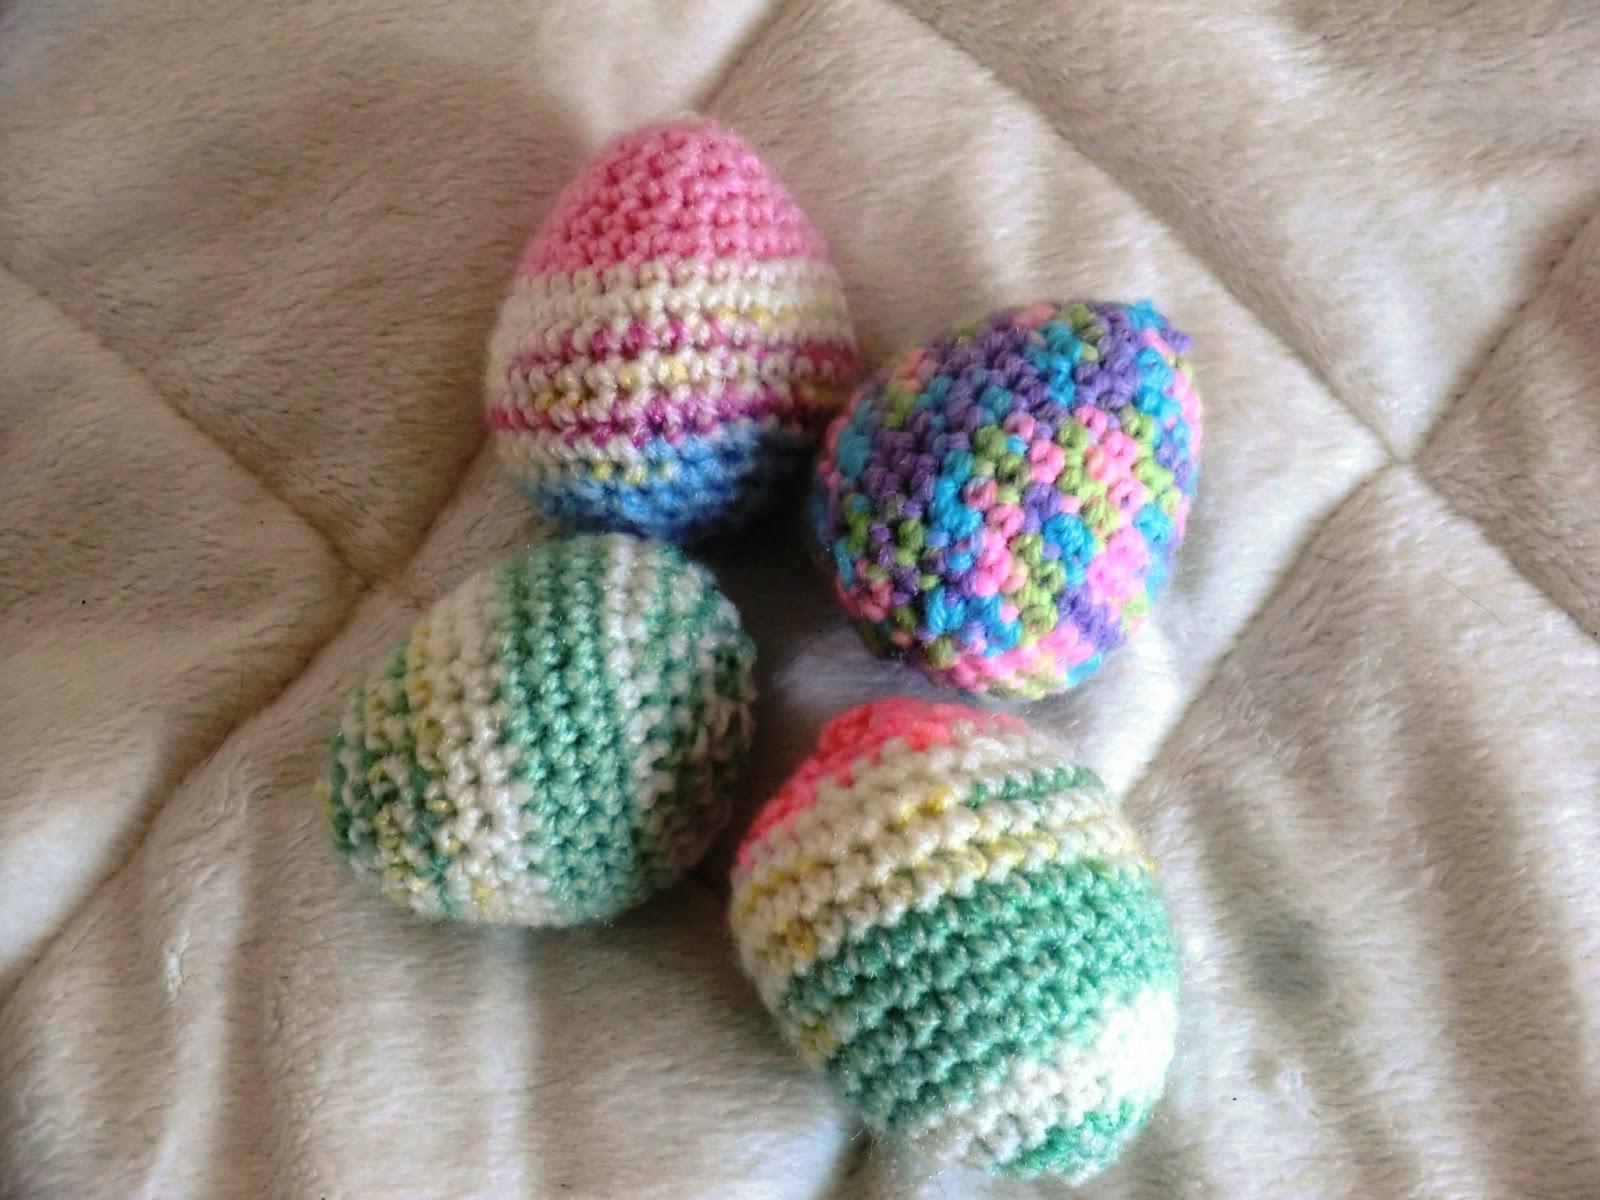 Amigurumi Barmy: Easter egg free pattern